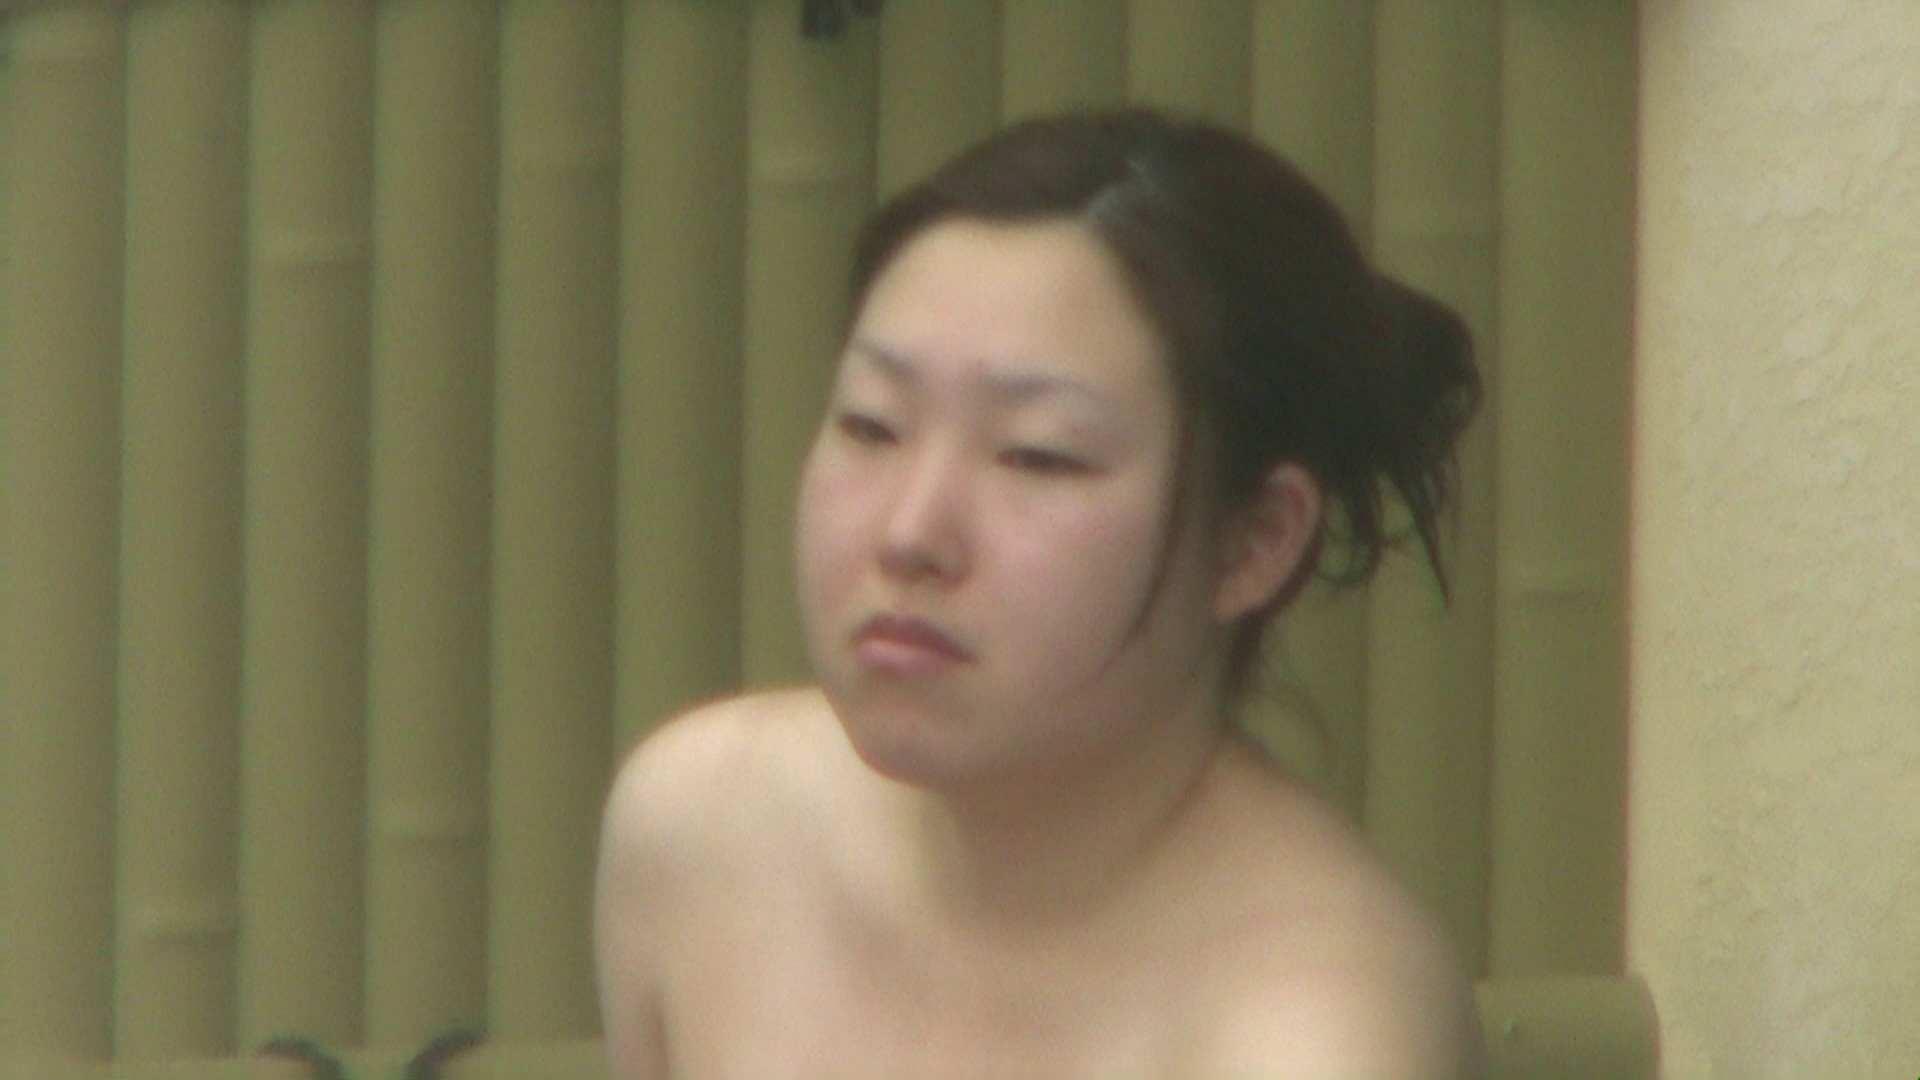 Aquaな露天風呂Vol.72【VIP限定】 盗撮 濡れ場動画紹介 25PICs 17